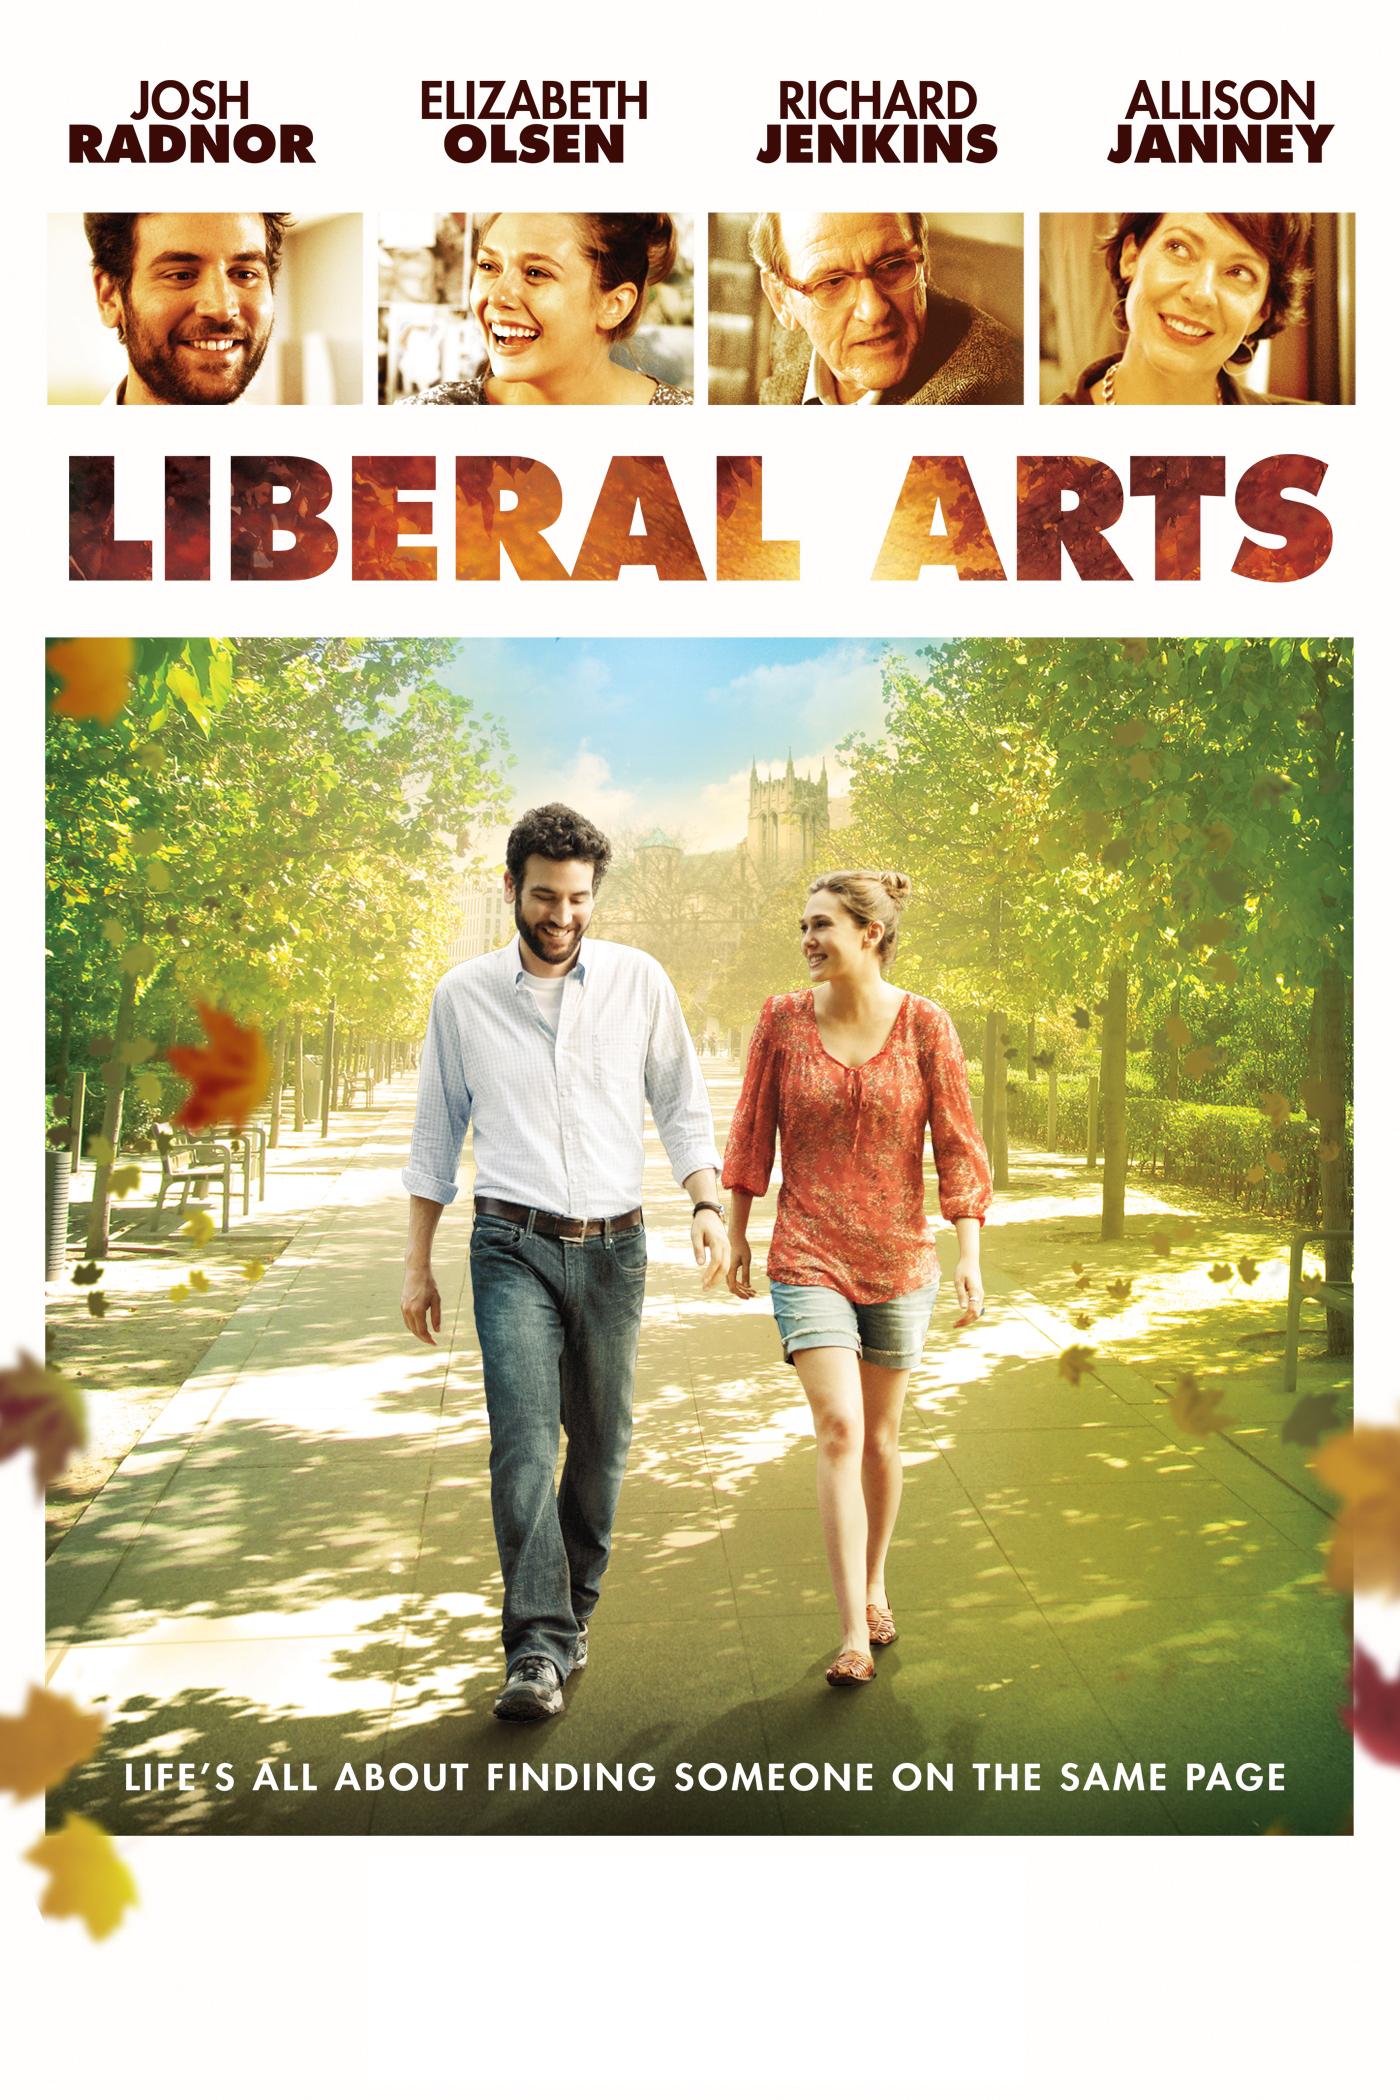 Liberal Arts Film